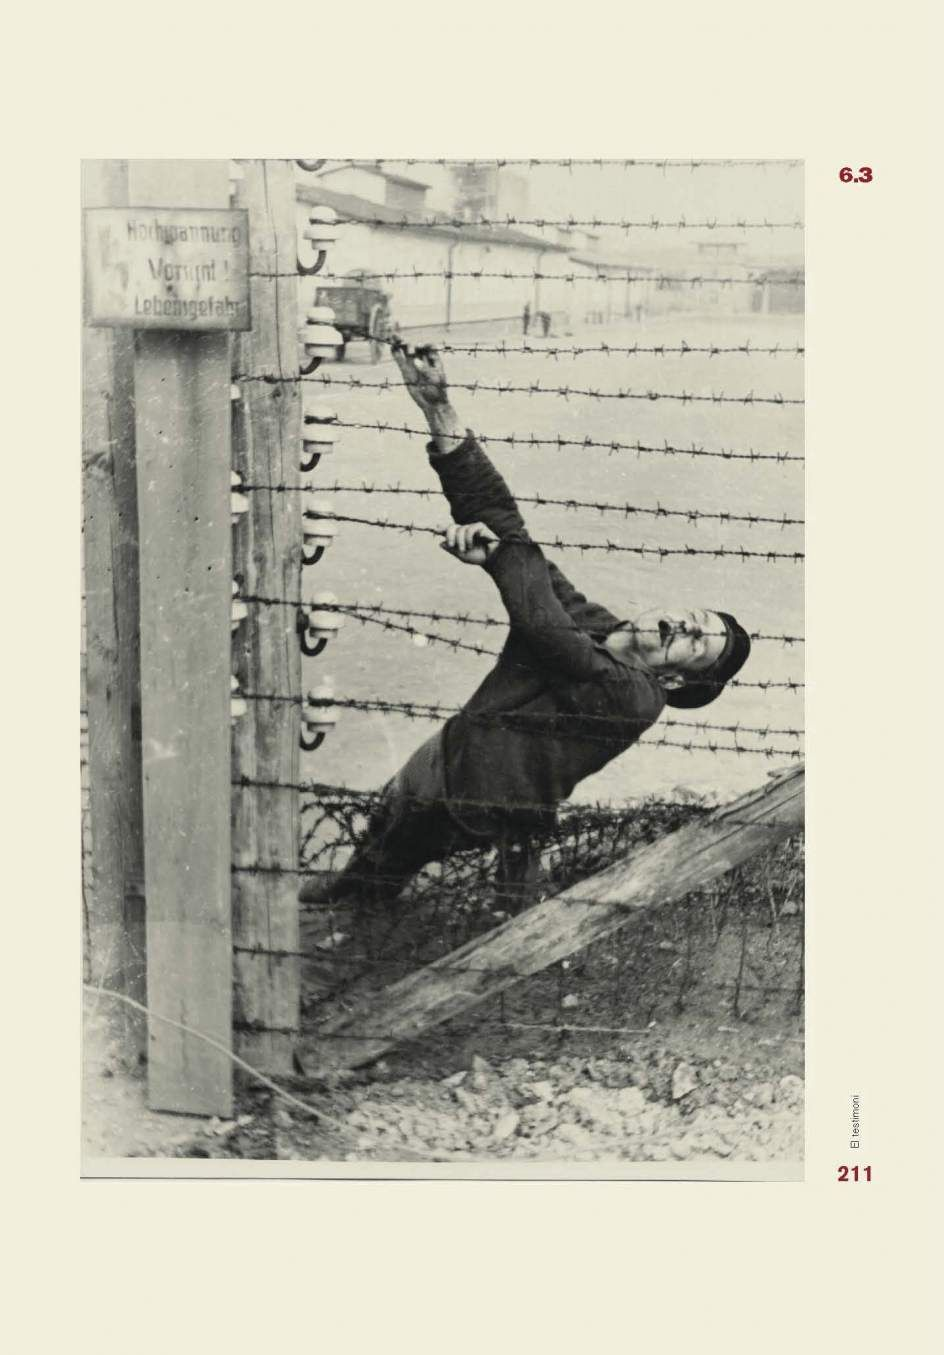 Prisionero muerto en Mauthausen | HISTORIA CONTEMPORÁNEA | Pinterest